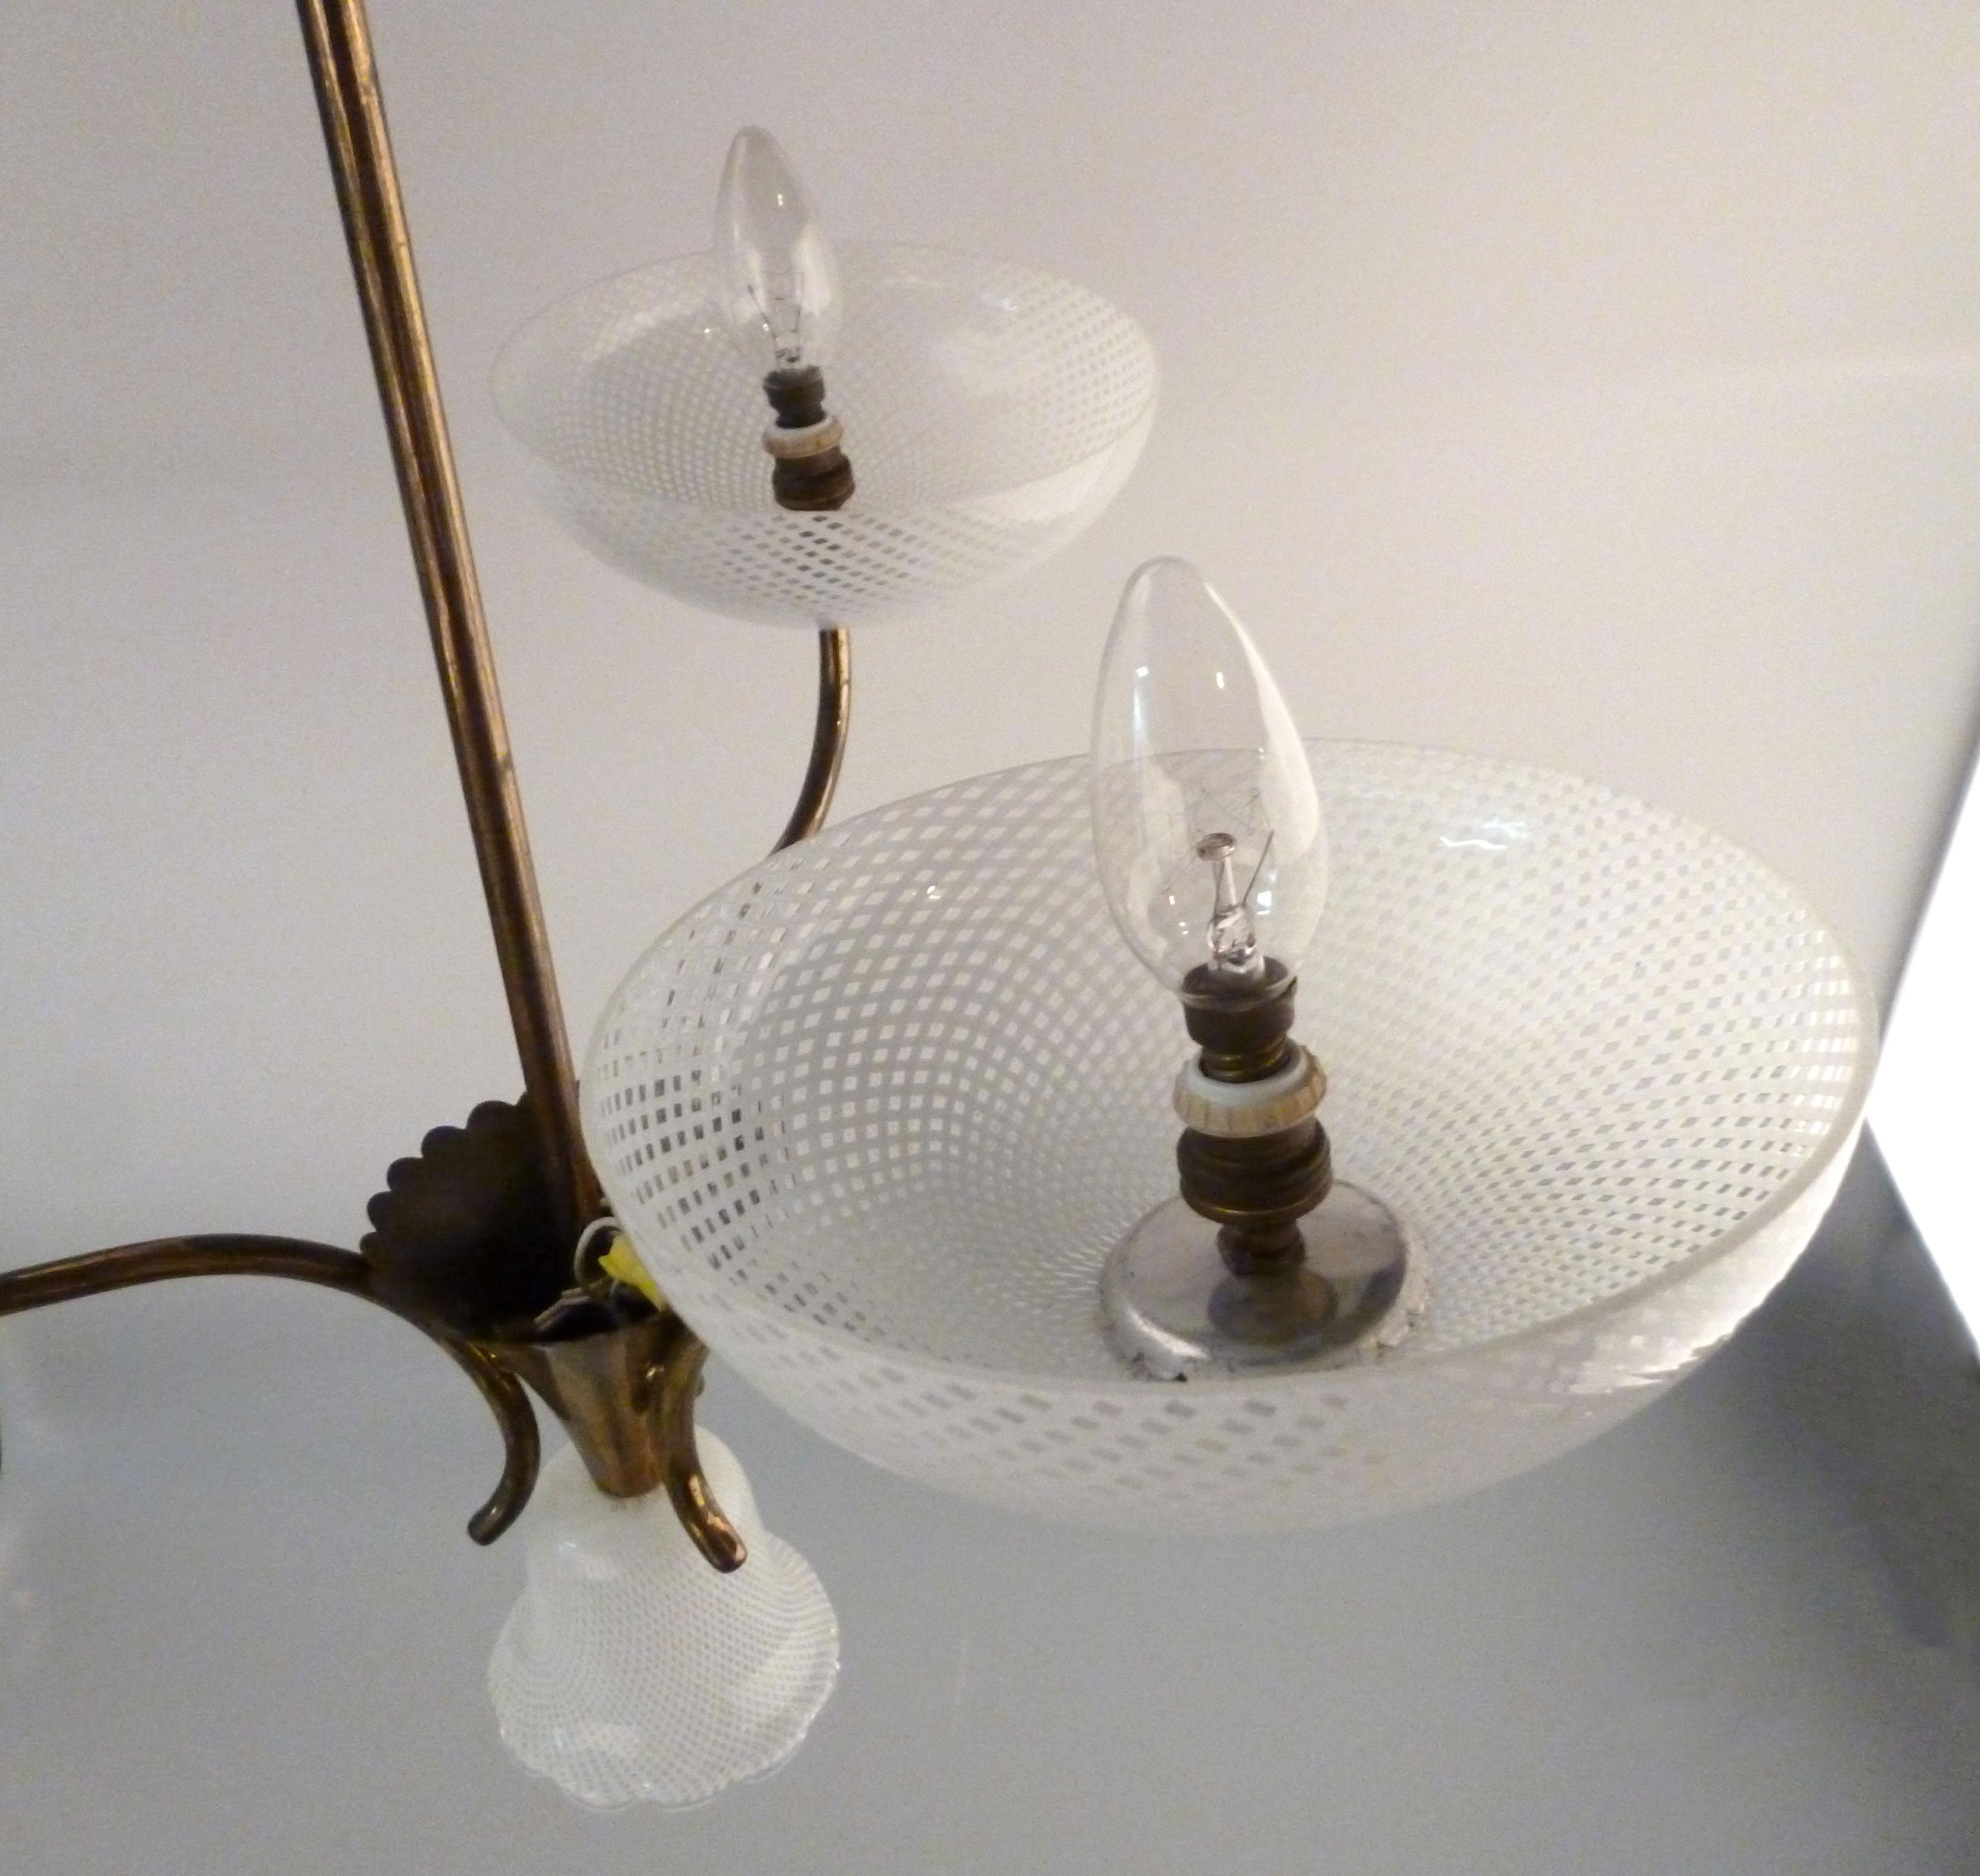 Seguso Filigreed Three Arm Chandelier Chairish : seguso filigreed three arm chandelier 2103aspectfitampwidth640ampheight640 from www.chairish.com size 640 x 640 jpeg 42kB